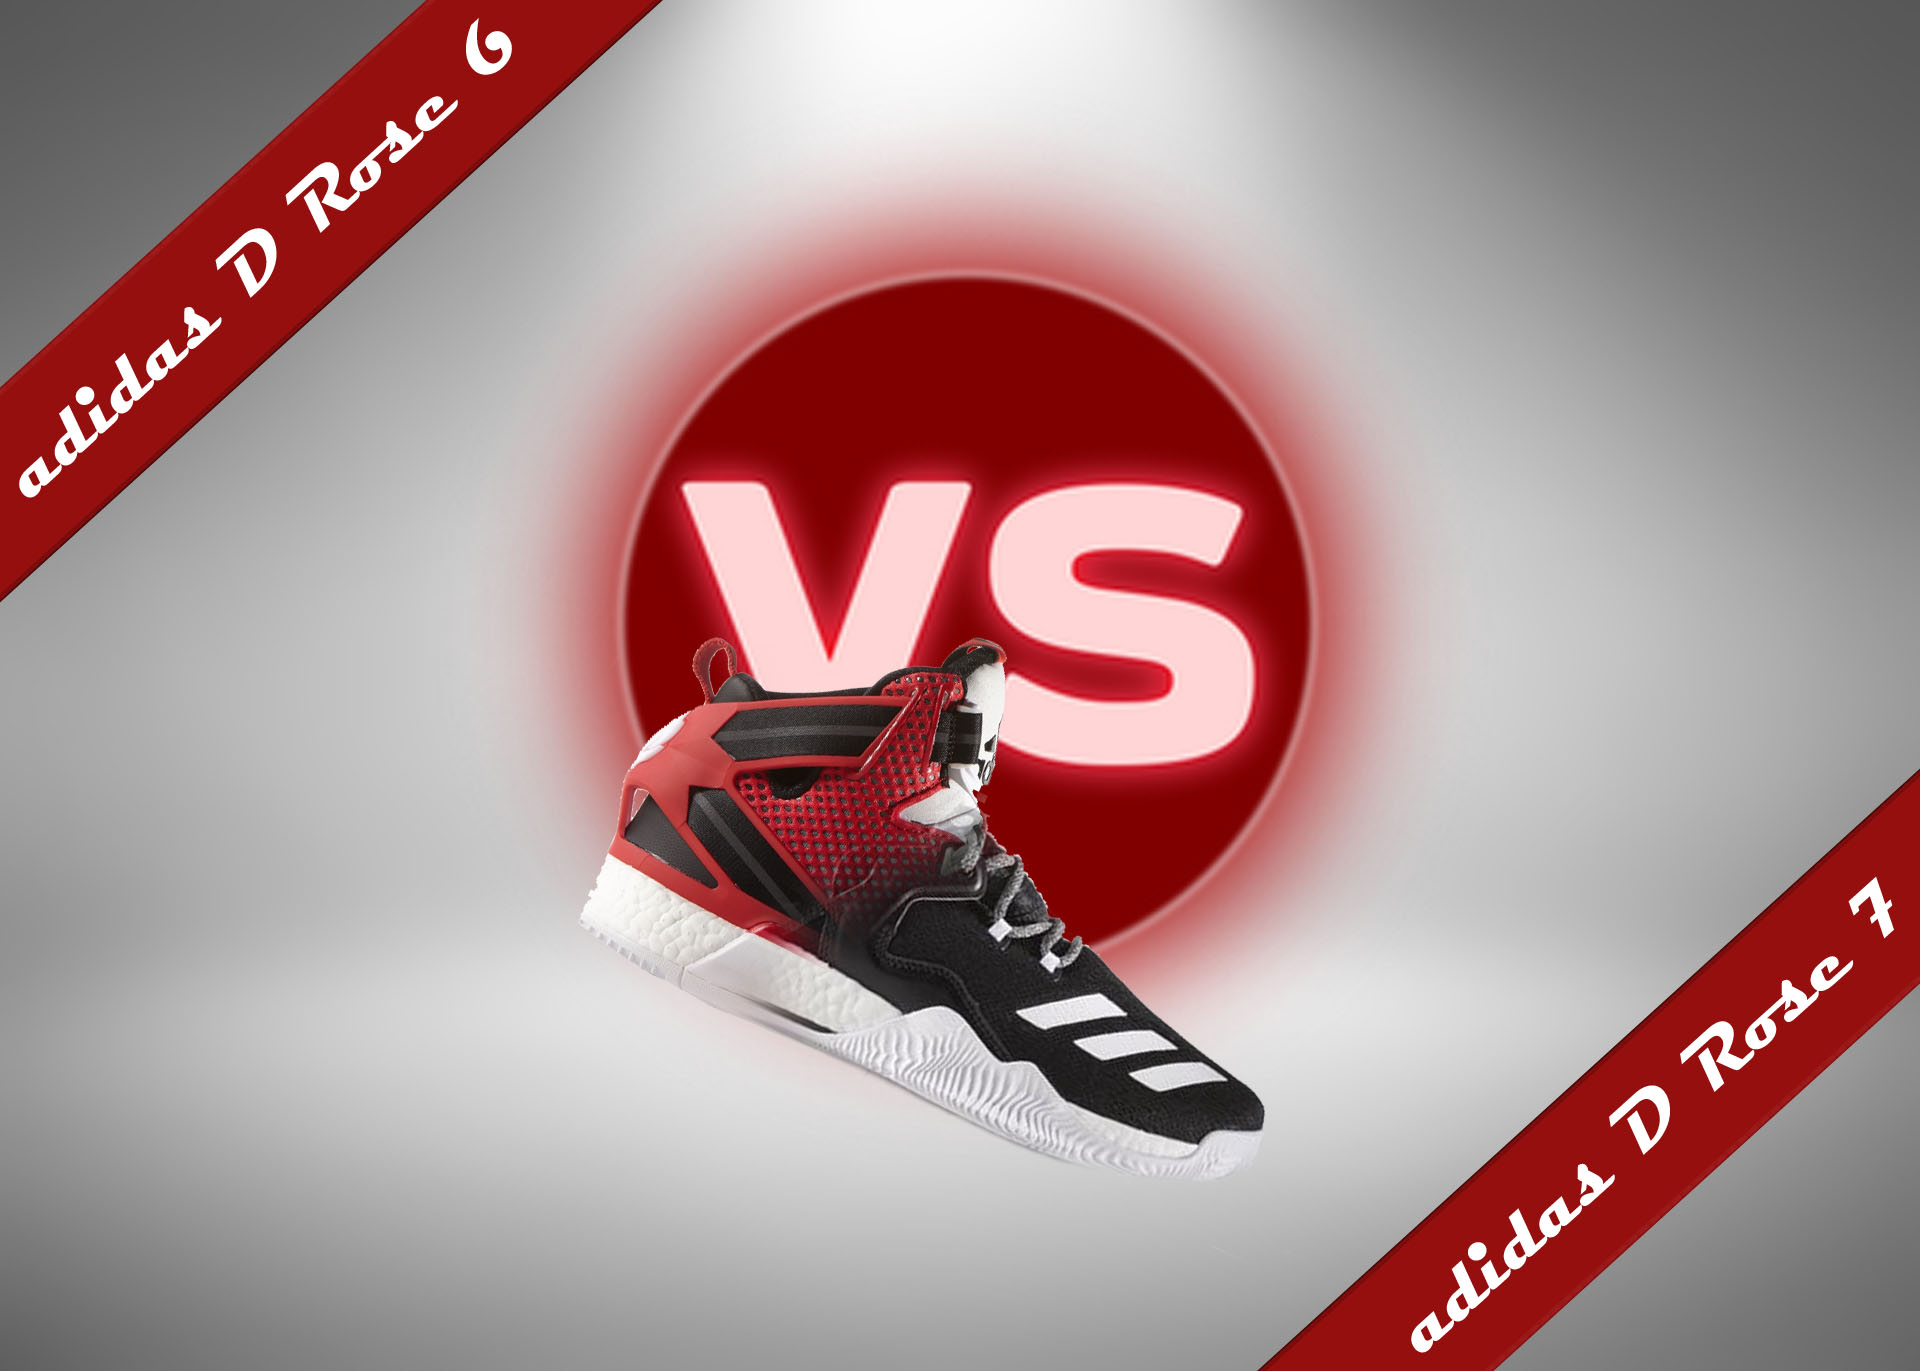 579e7a4a595b adidas   Basketball   Kicks On Court   VS ...